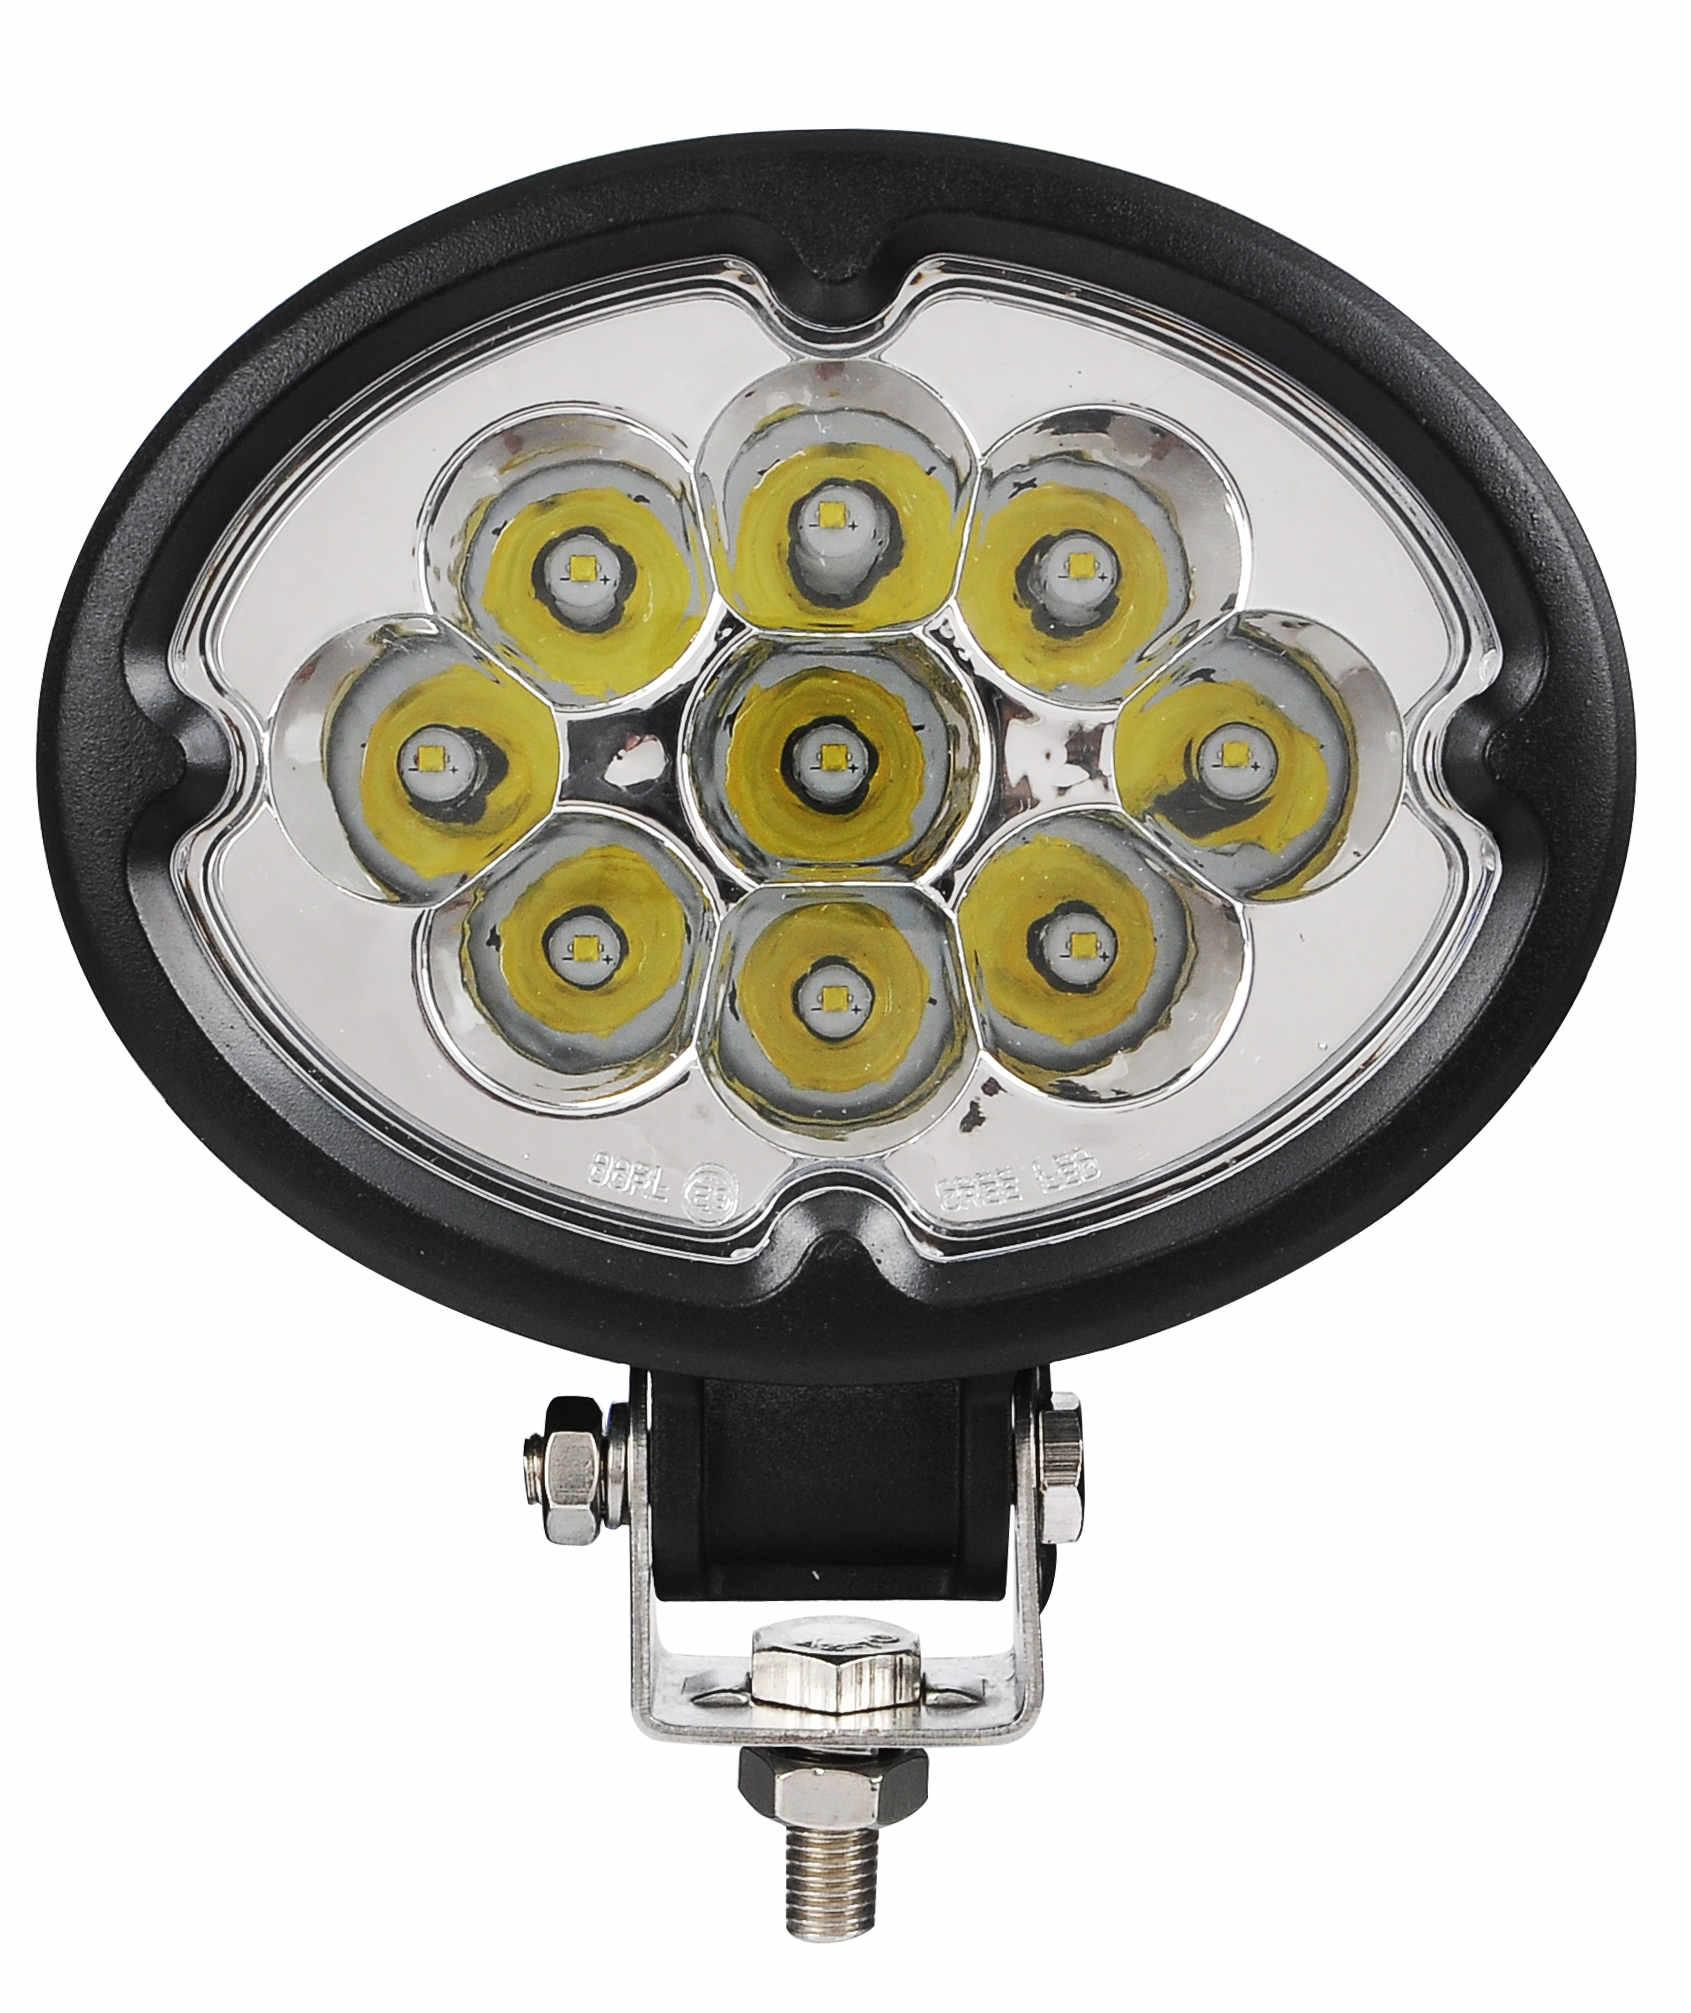 "5.8"" 27W CREE 椭圆形 LED 工作灯泛光灯沙滩灯越野灯驾驶灯 3"